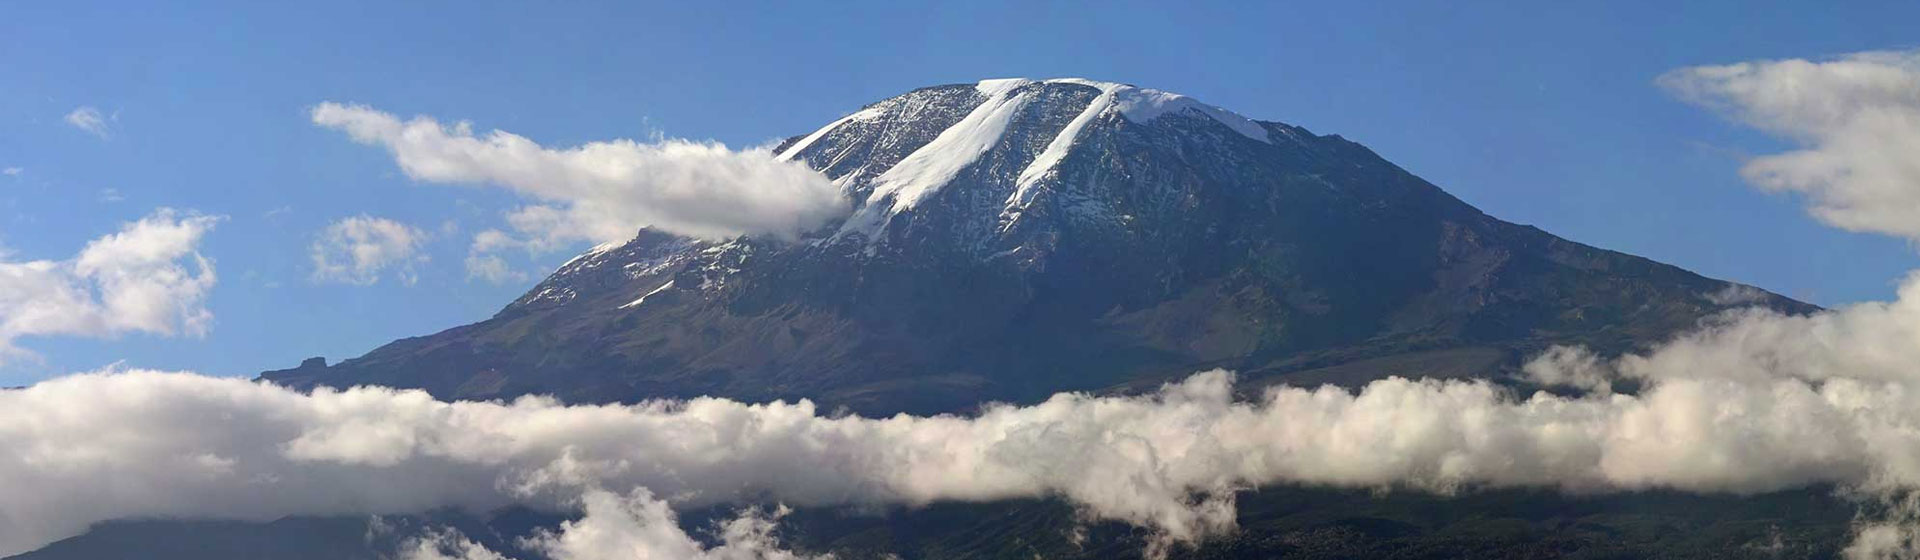 Kilimanjaro Tailormade